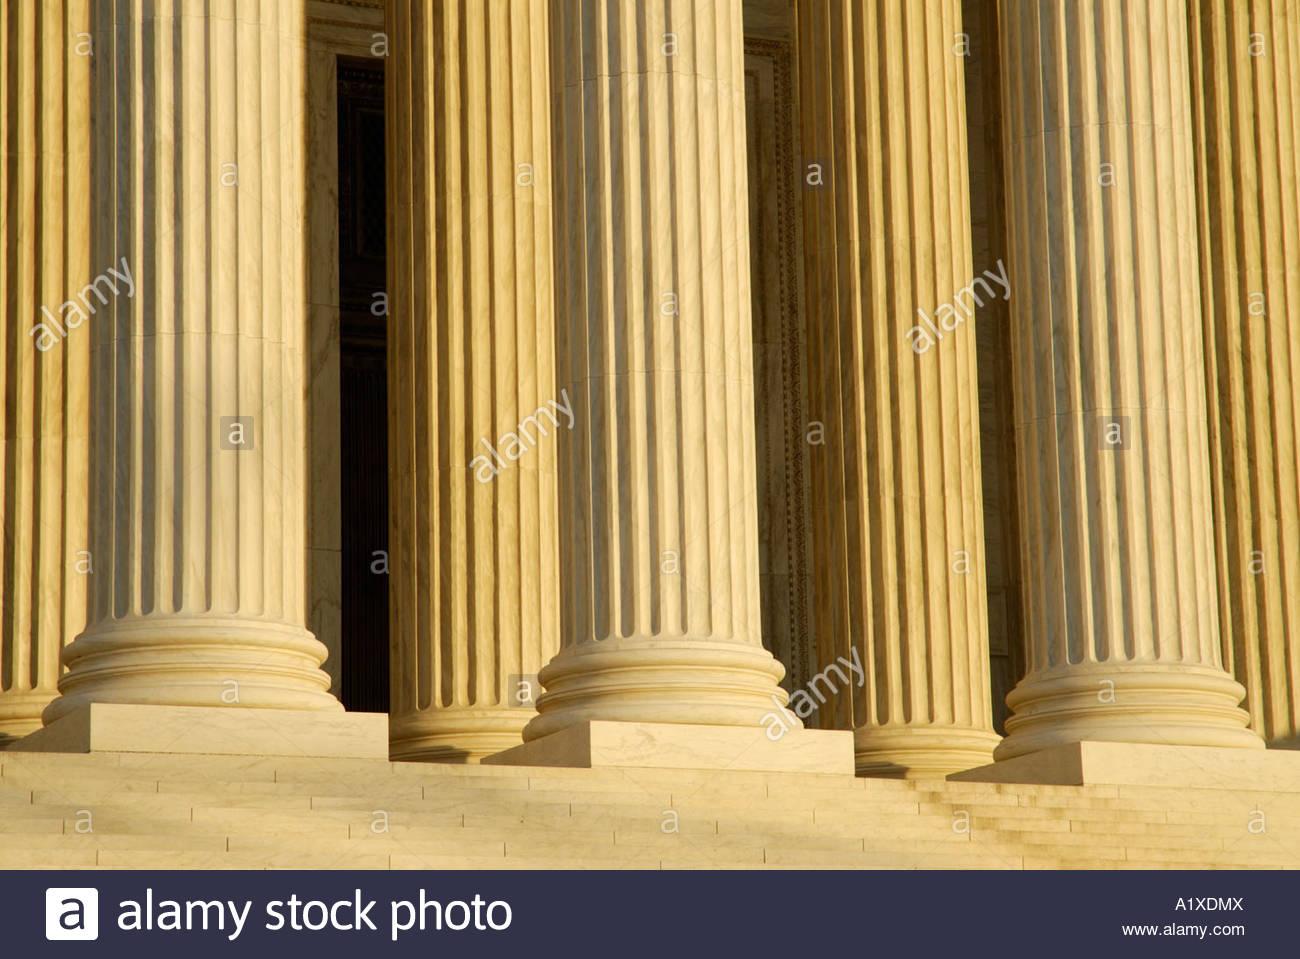 United States U.S. supreme court building exterior pillars - Stock Image